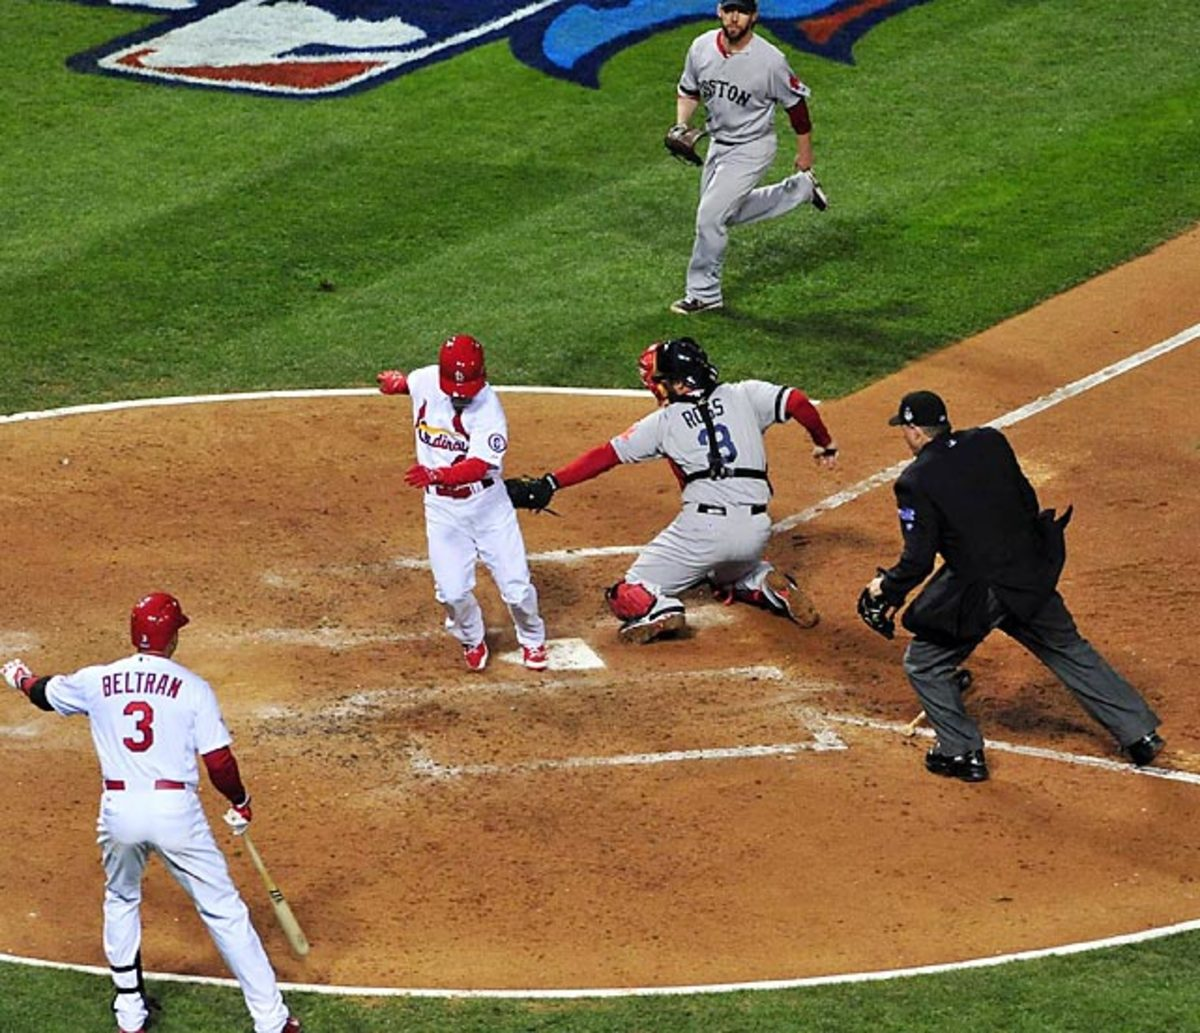 Red Sox 4, Cardinals 2